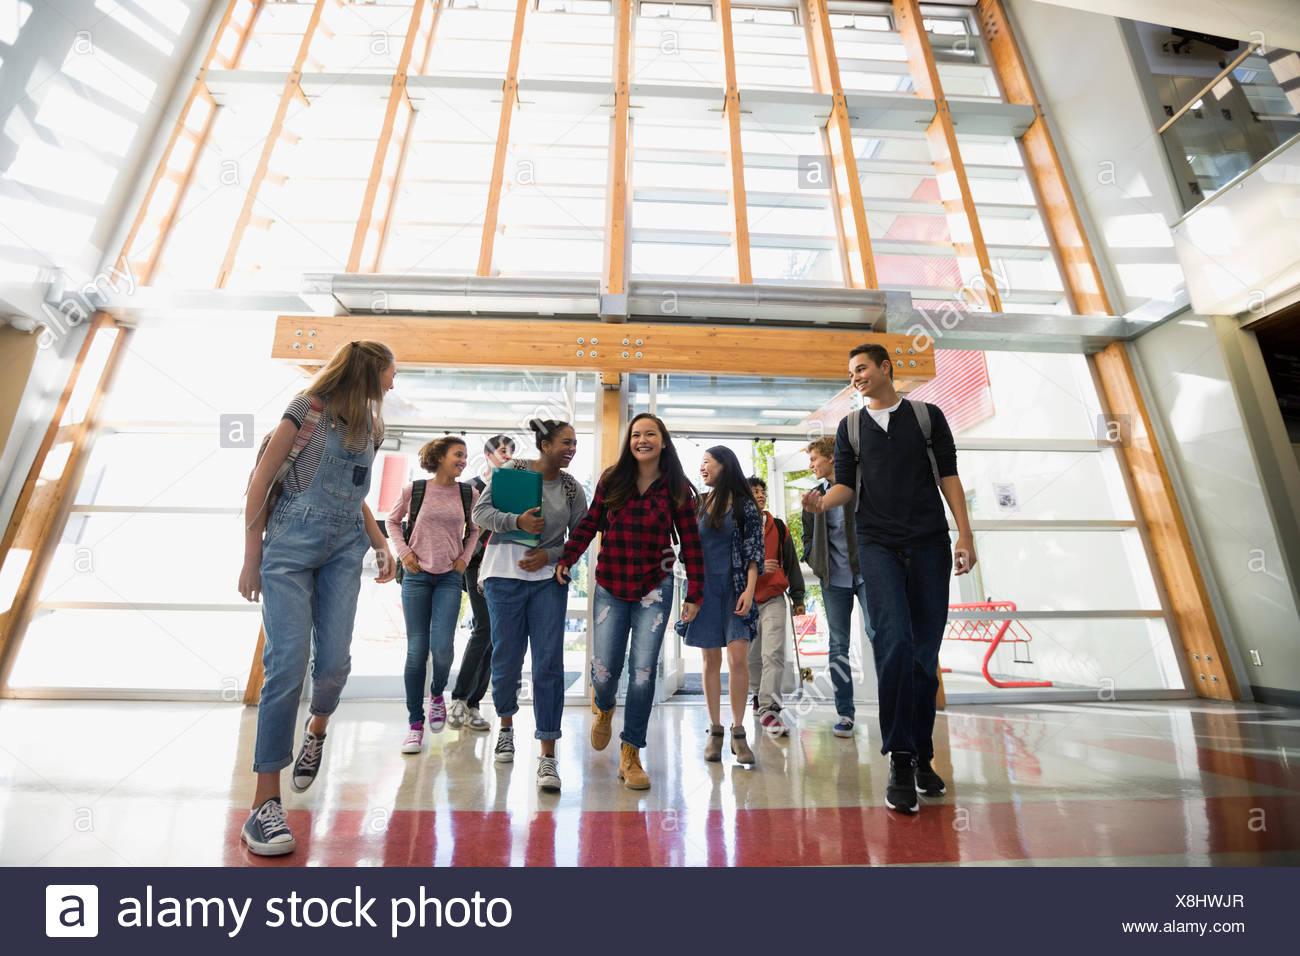 Schülerinnen und Schüler Schule Türen betreten Stockbild